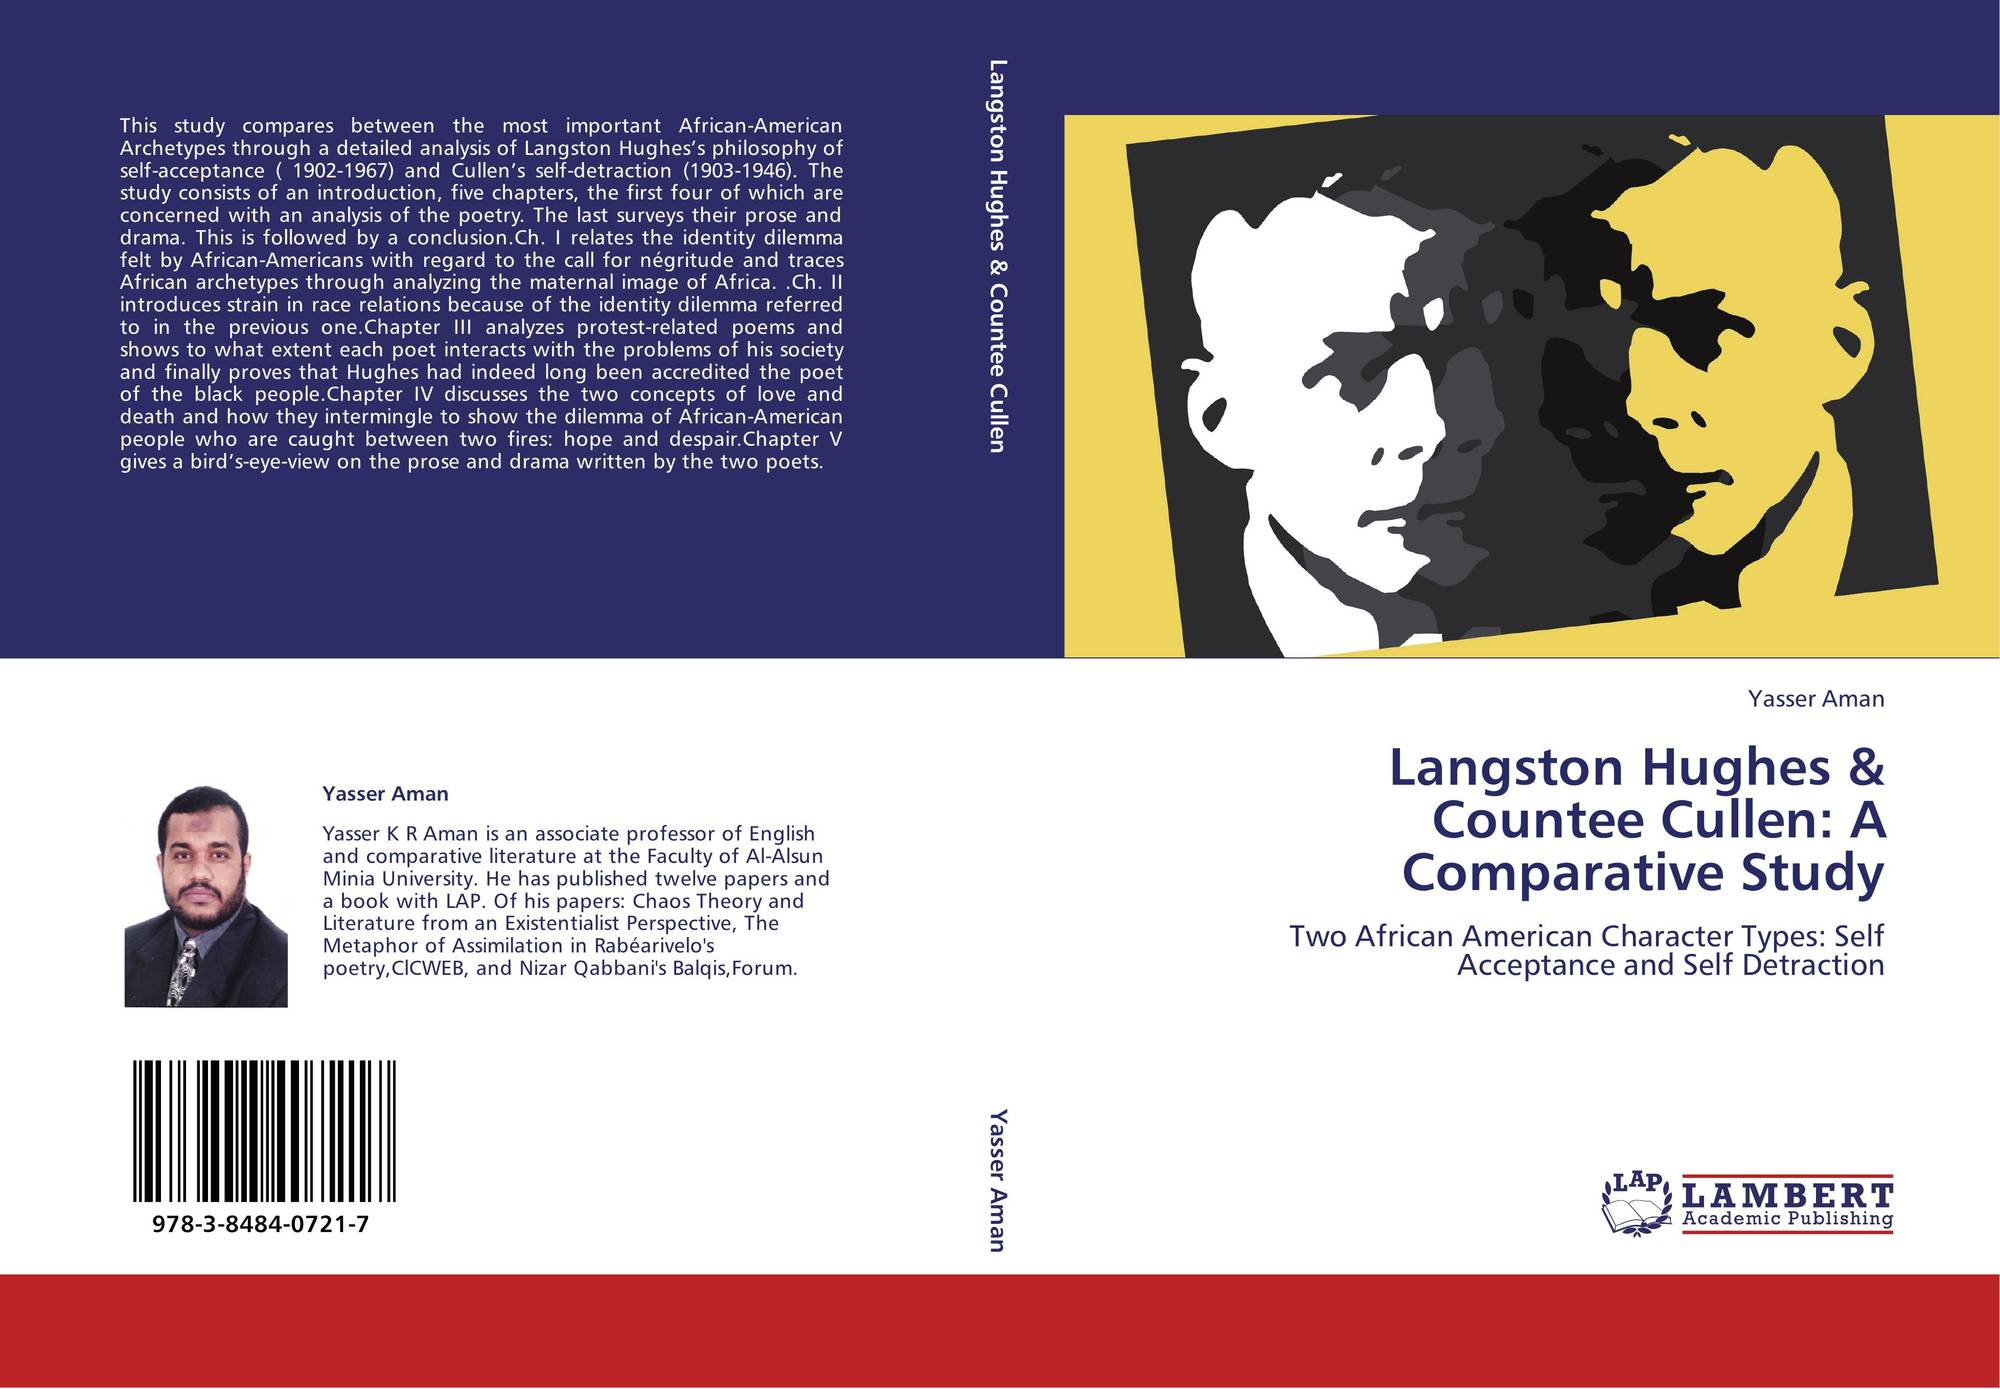 a comparison of langston hughes' end